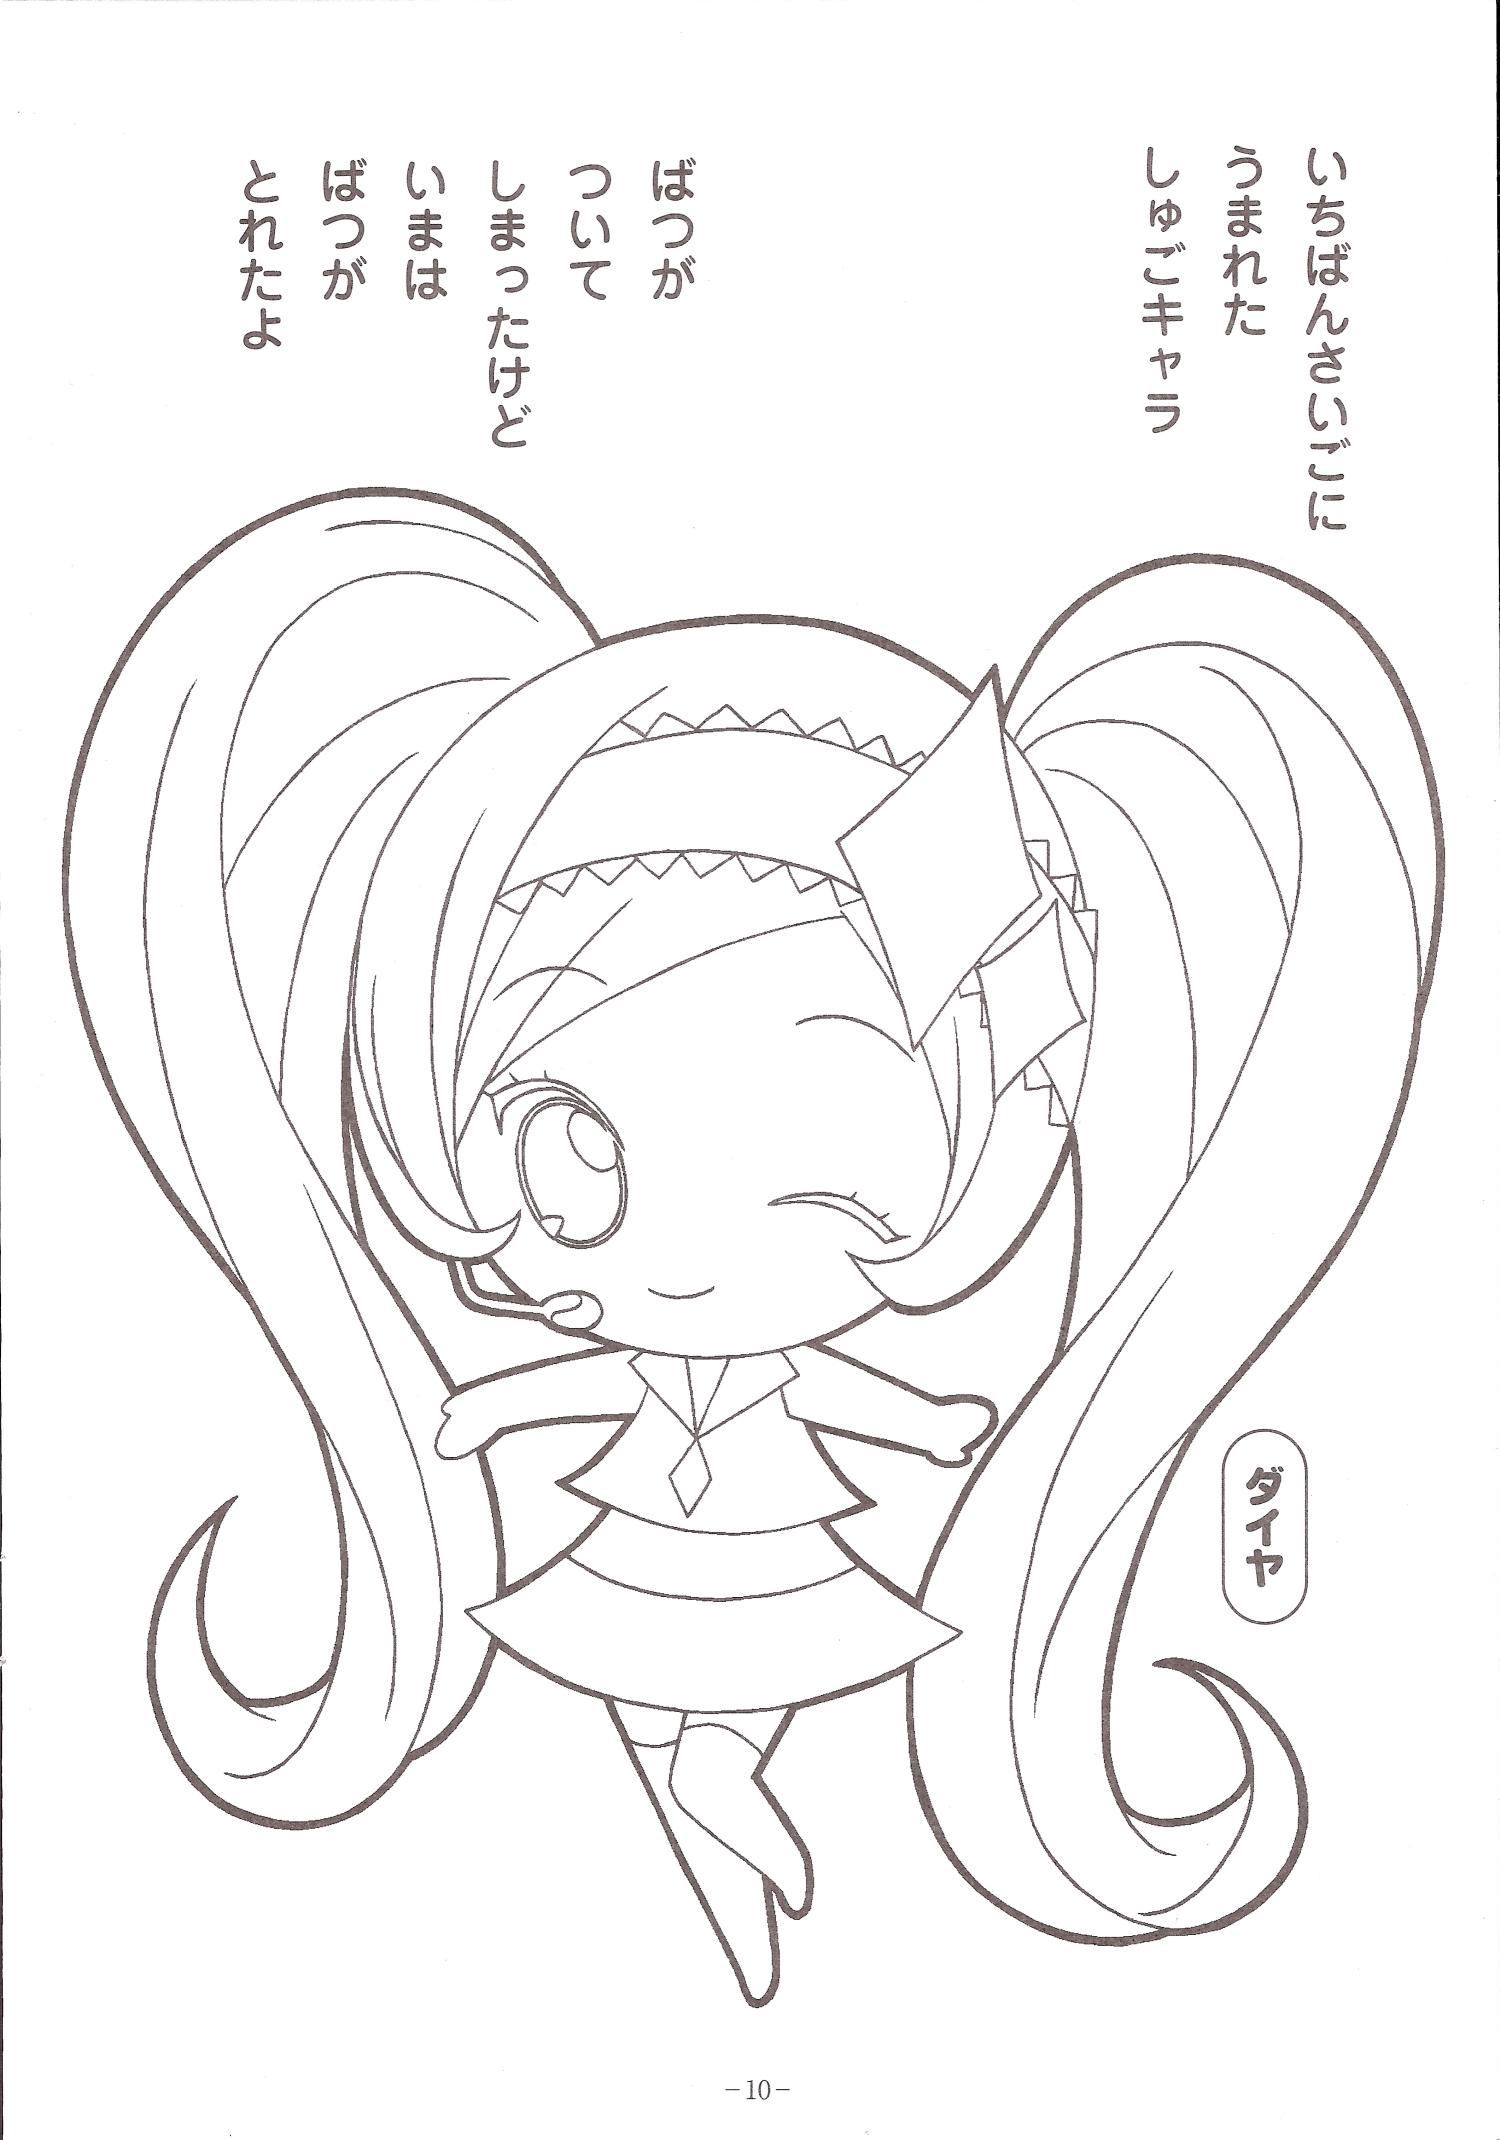 shugo chara coloring pages - immagini da colorare shugo chara